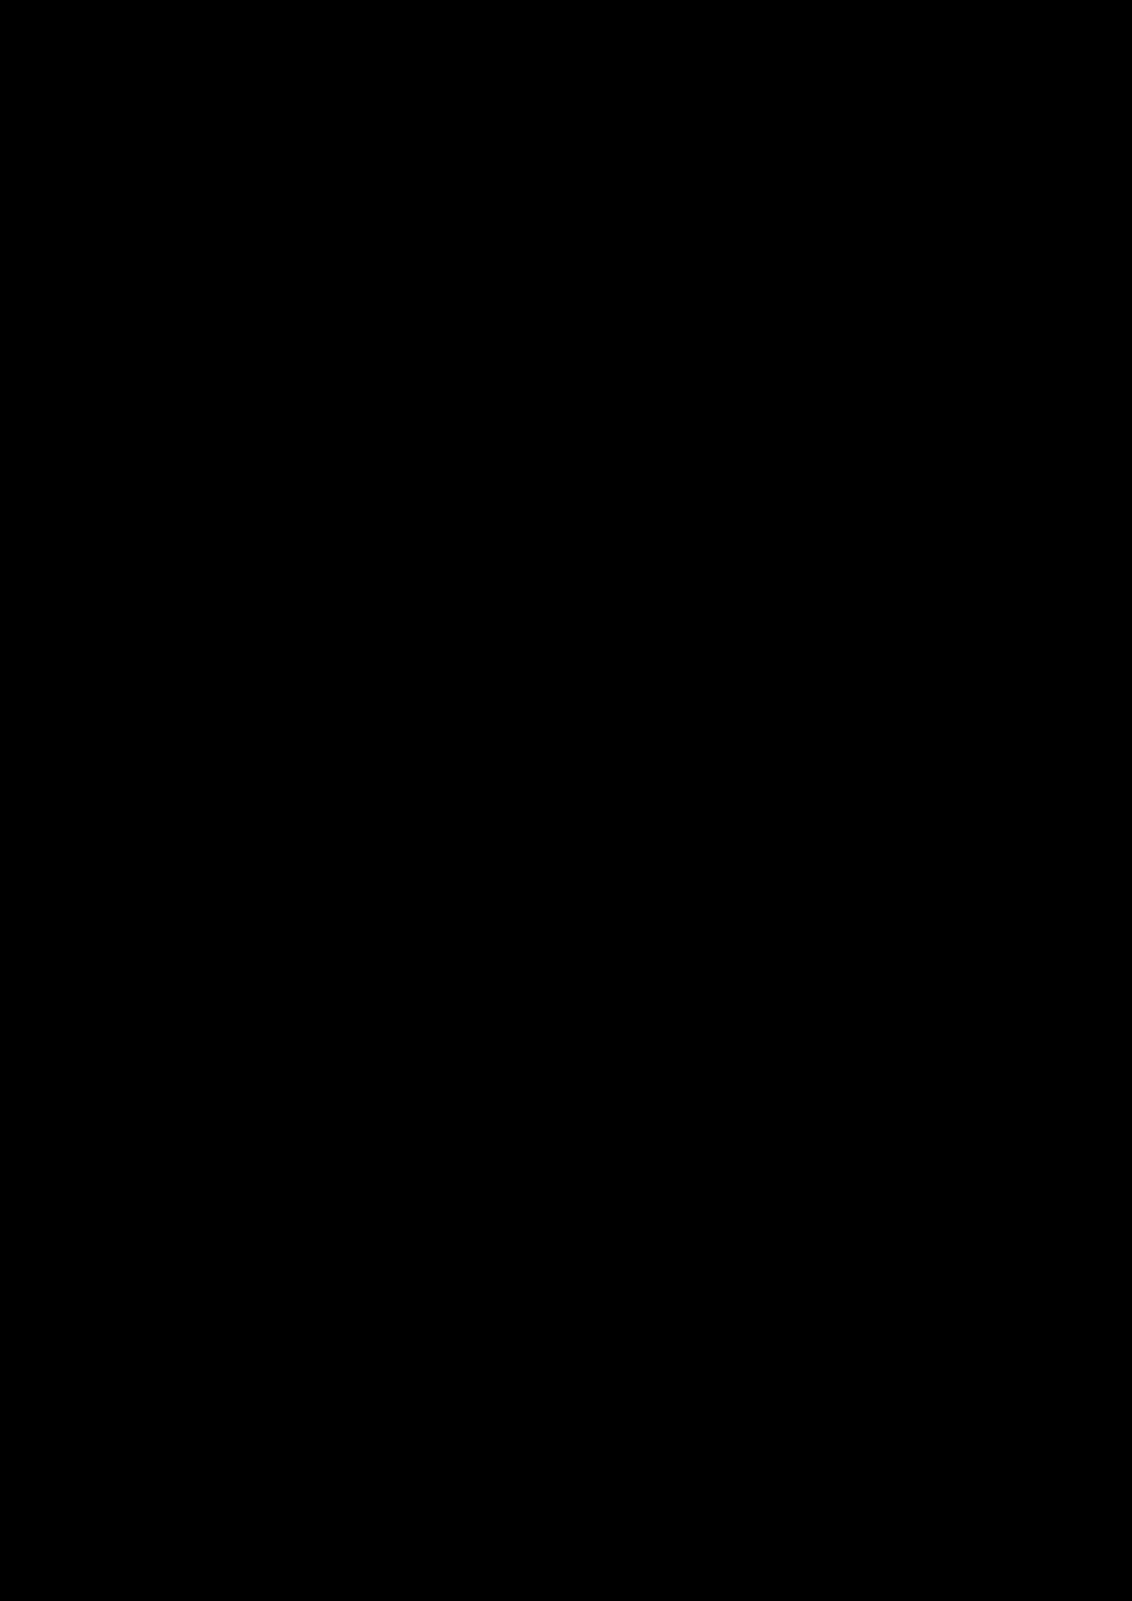 Belyiy sokol slide, Image 157